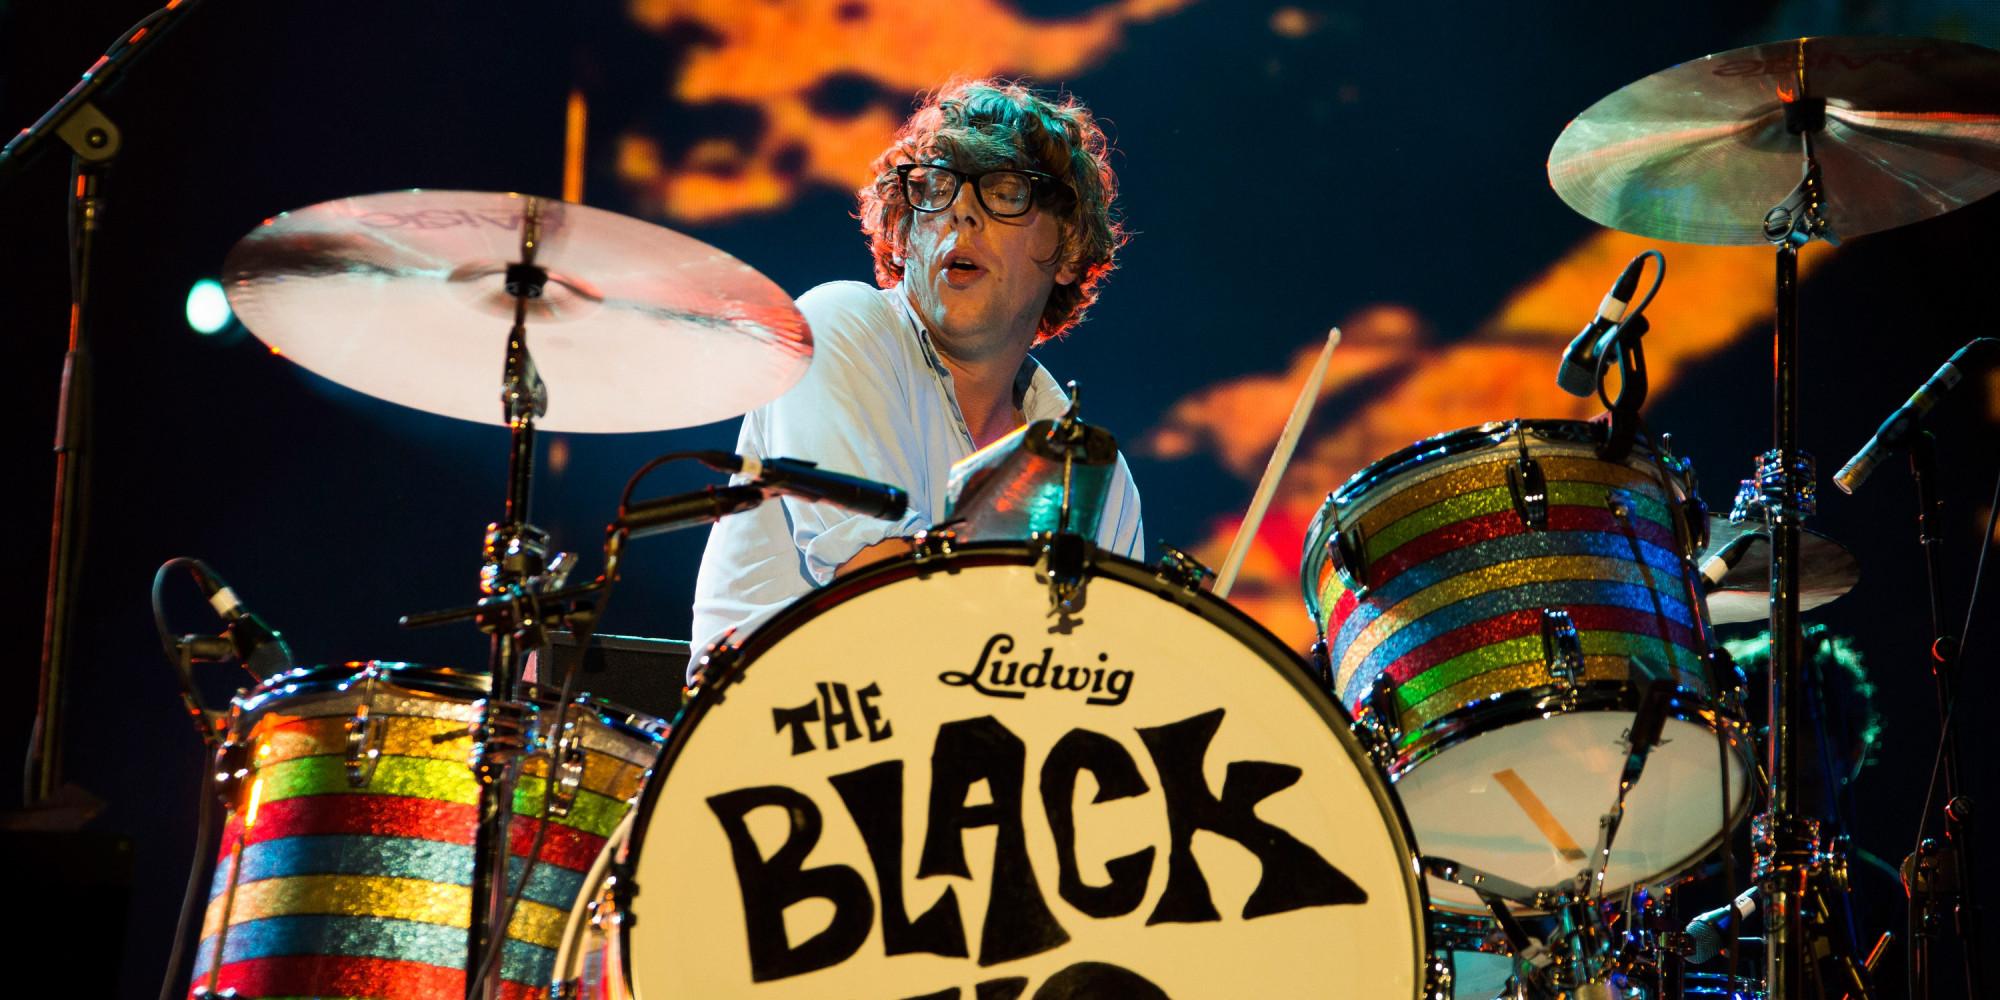 Patrick Carney Of The Black Keys Slams Michael Jackson's ...